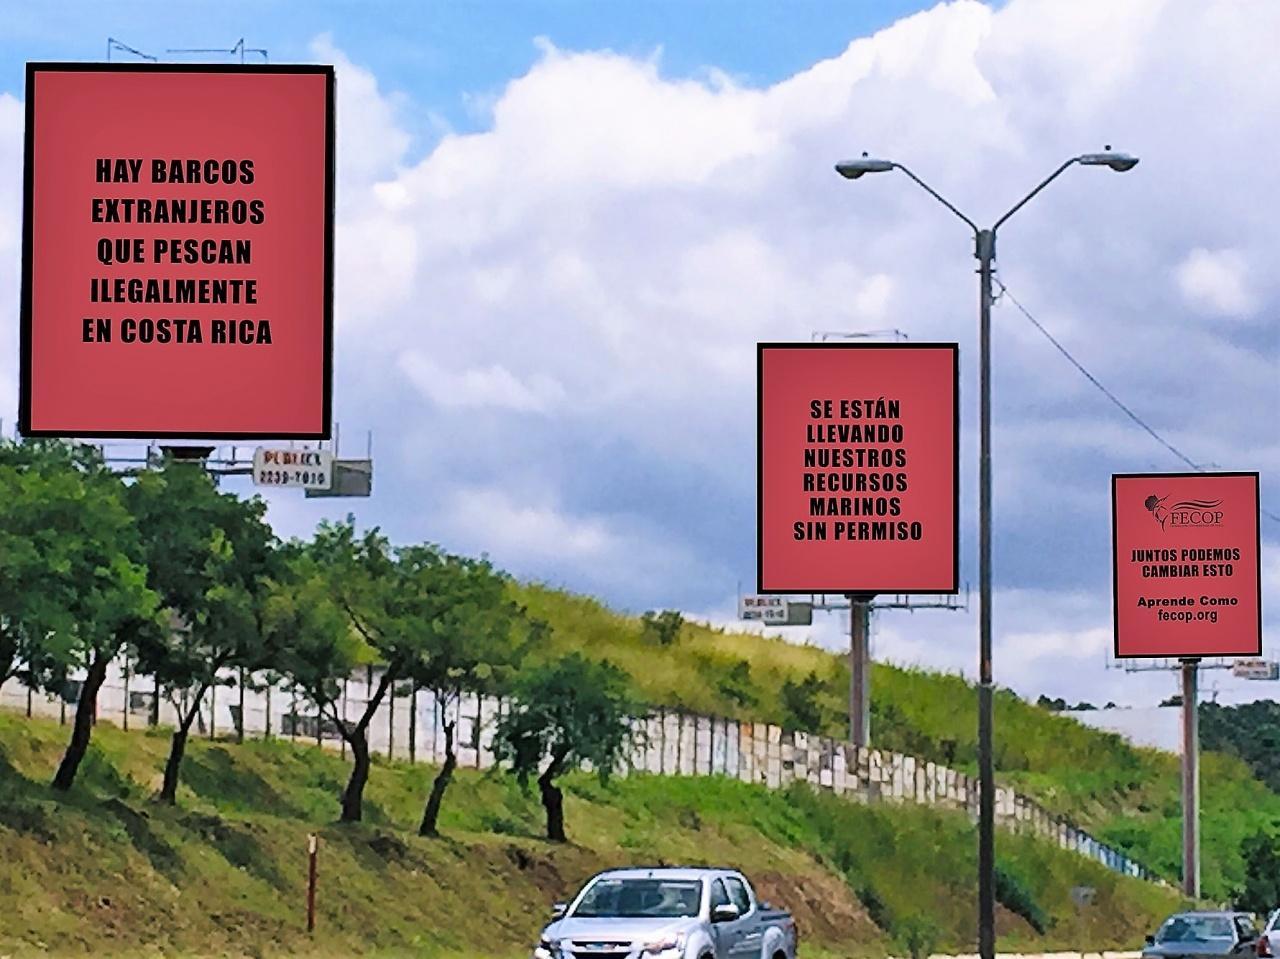 Costa Rica 3 Billboards Campaign-3billboards-jpg